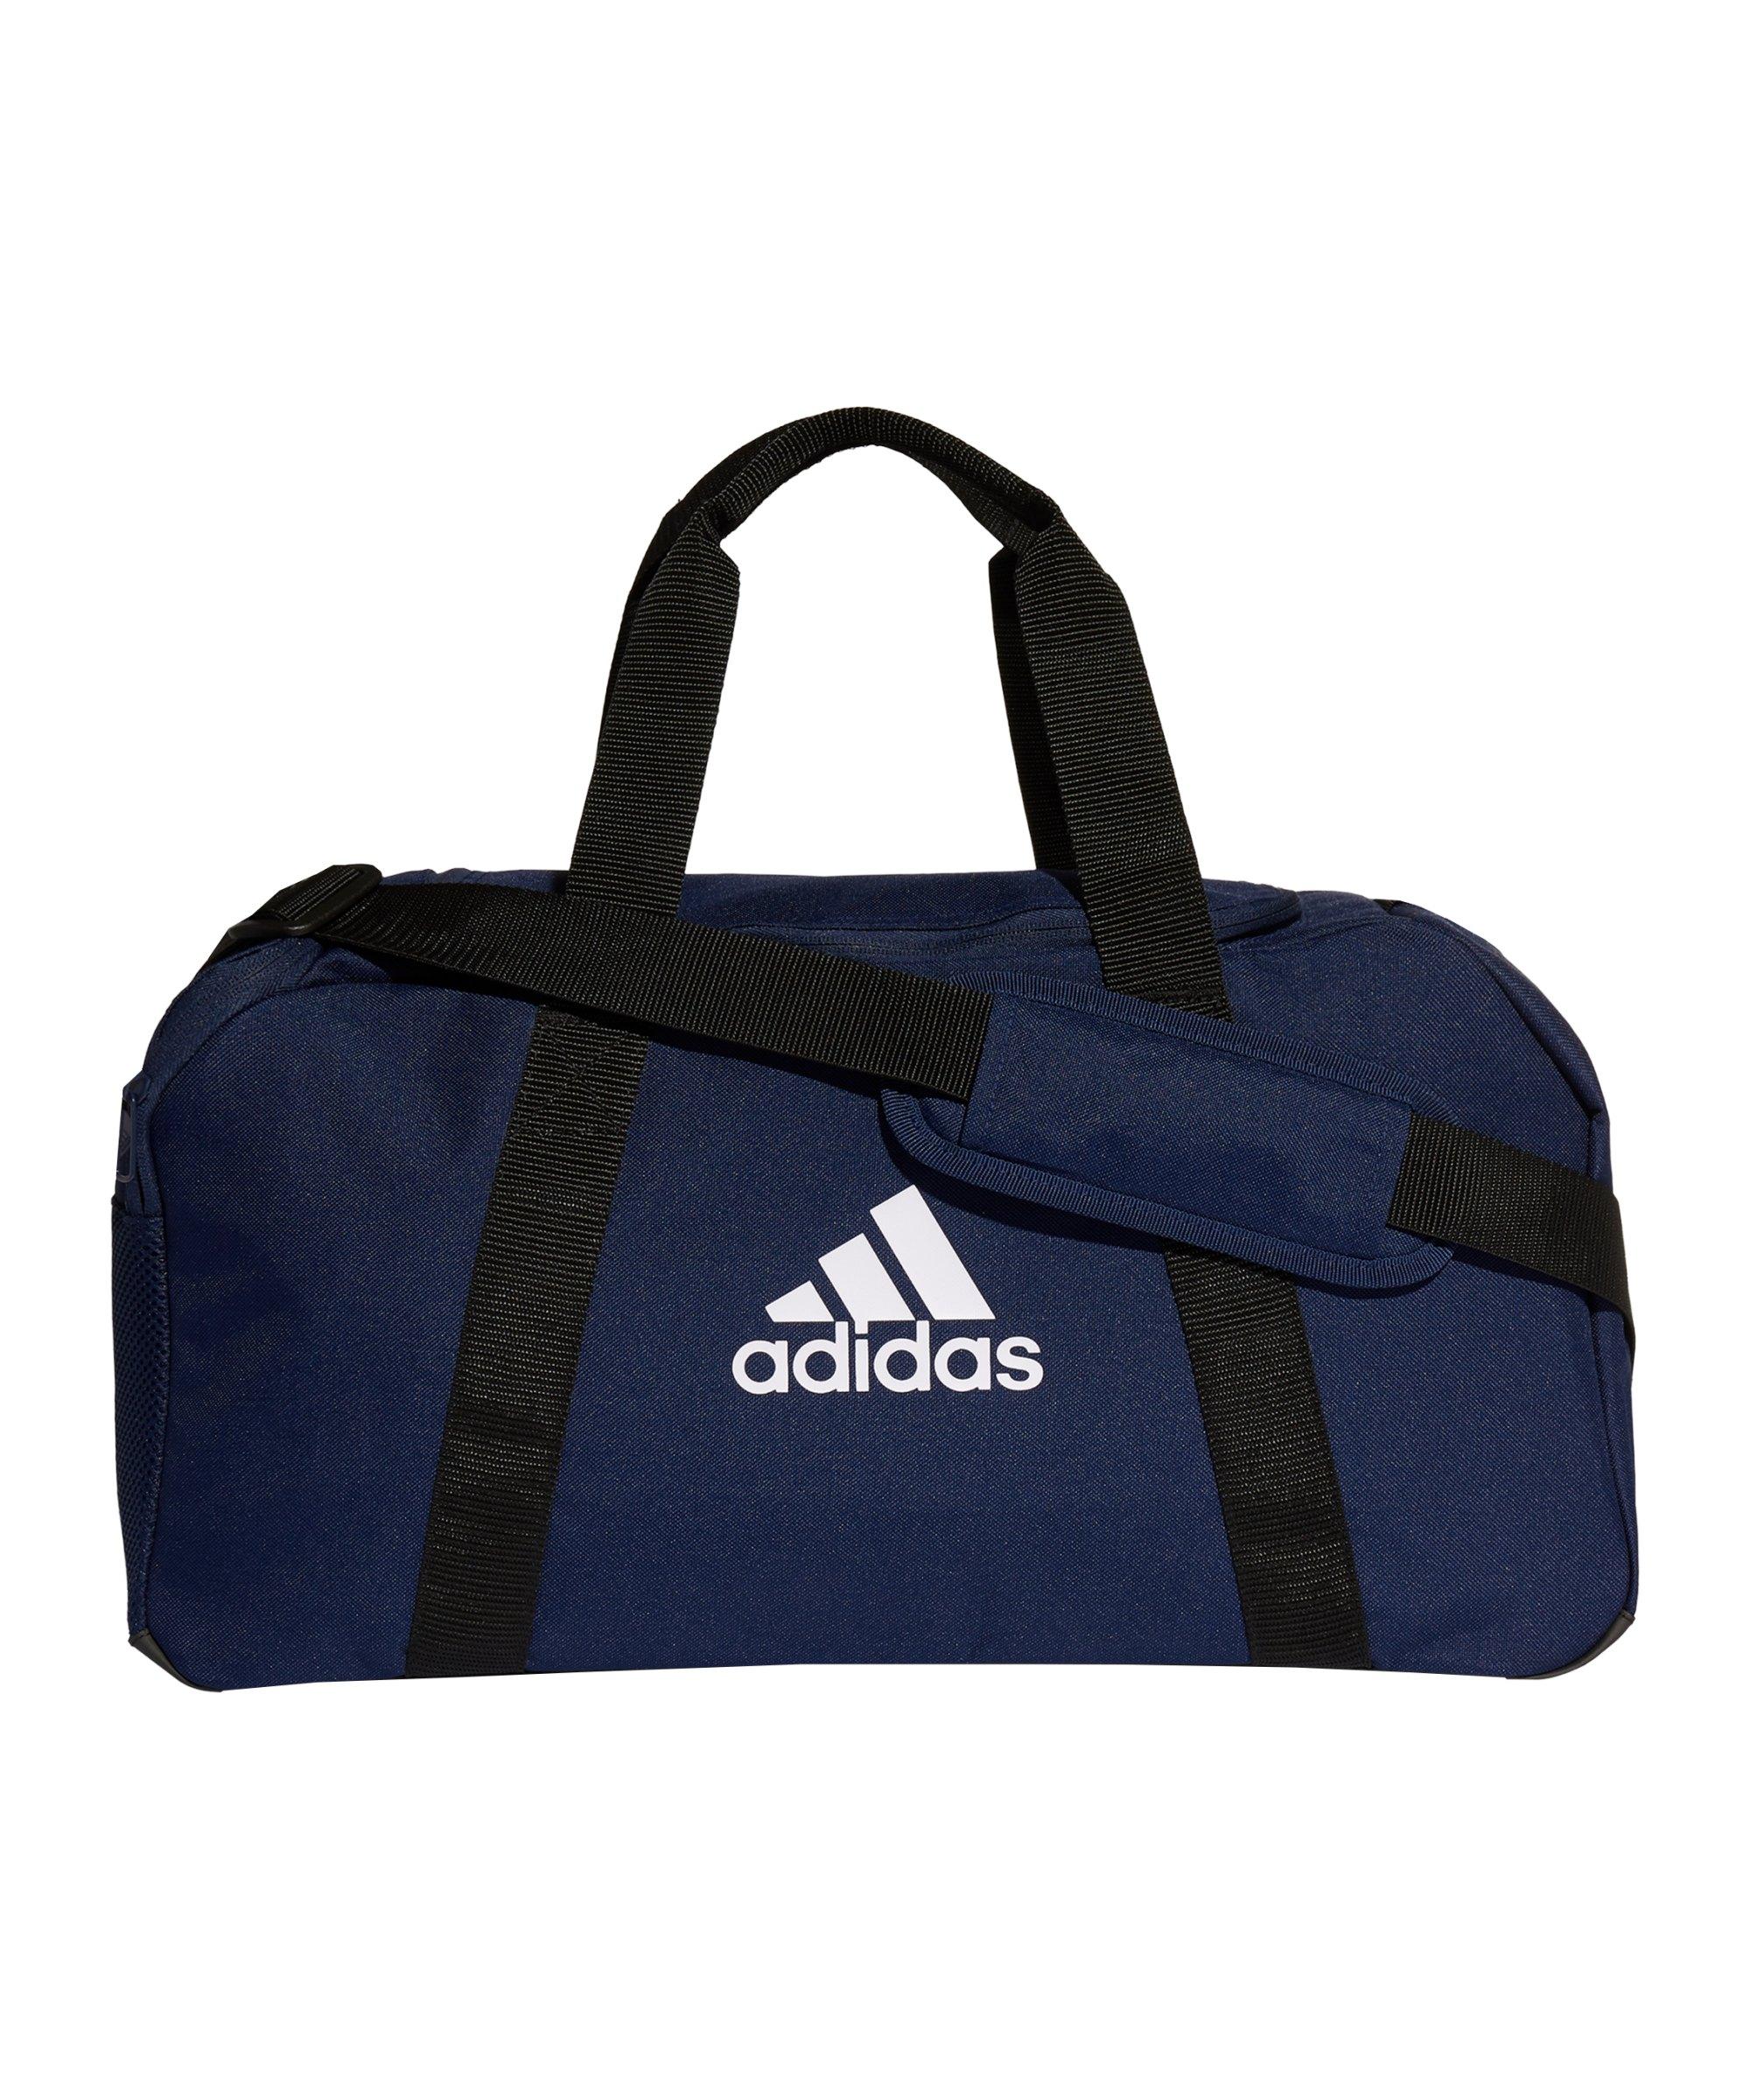 adidas Tiro Duffle Bag Gr. S Blau Weiss - blau